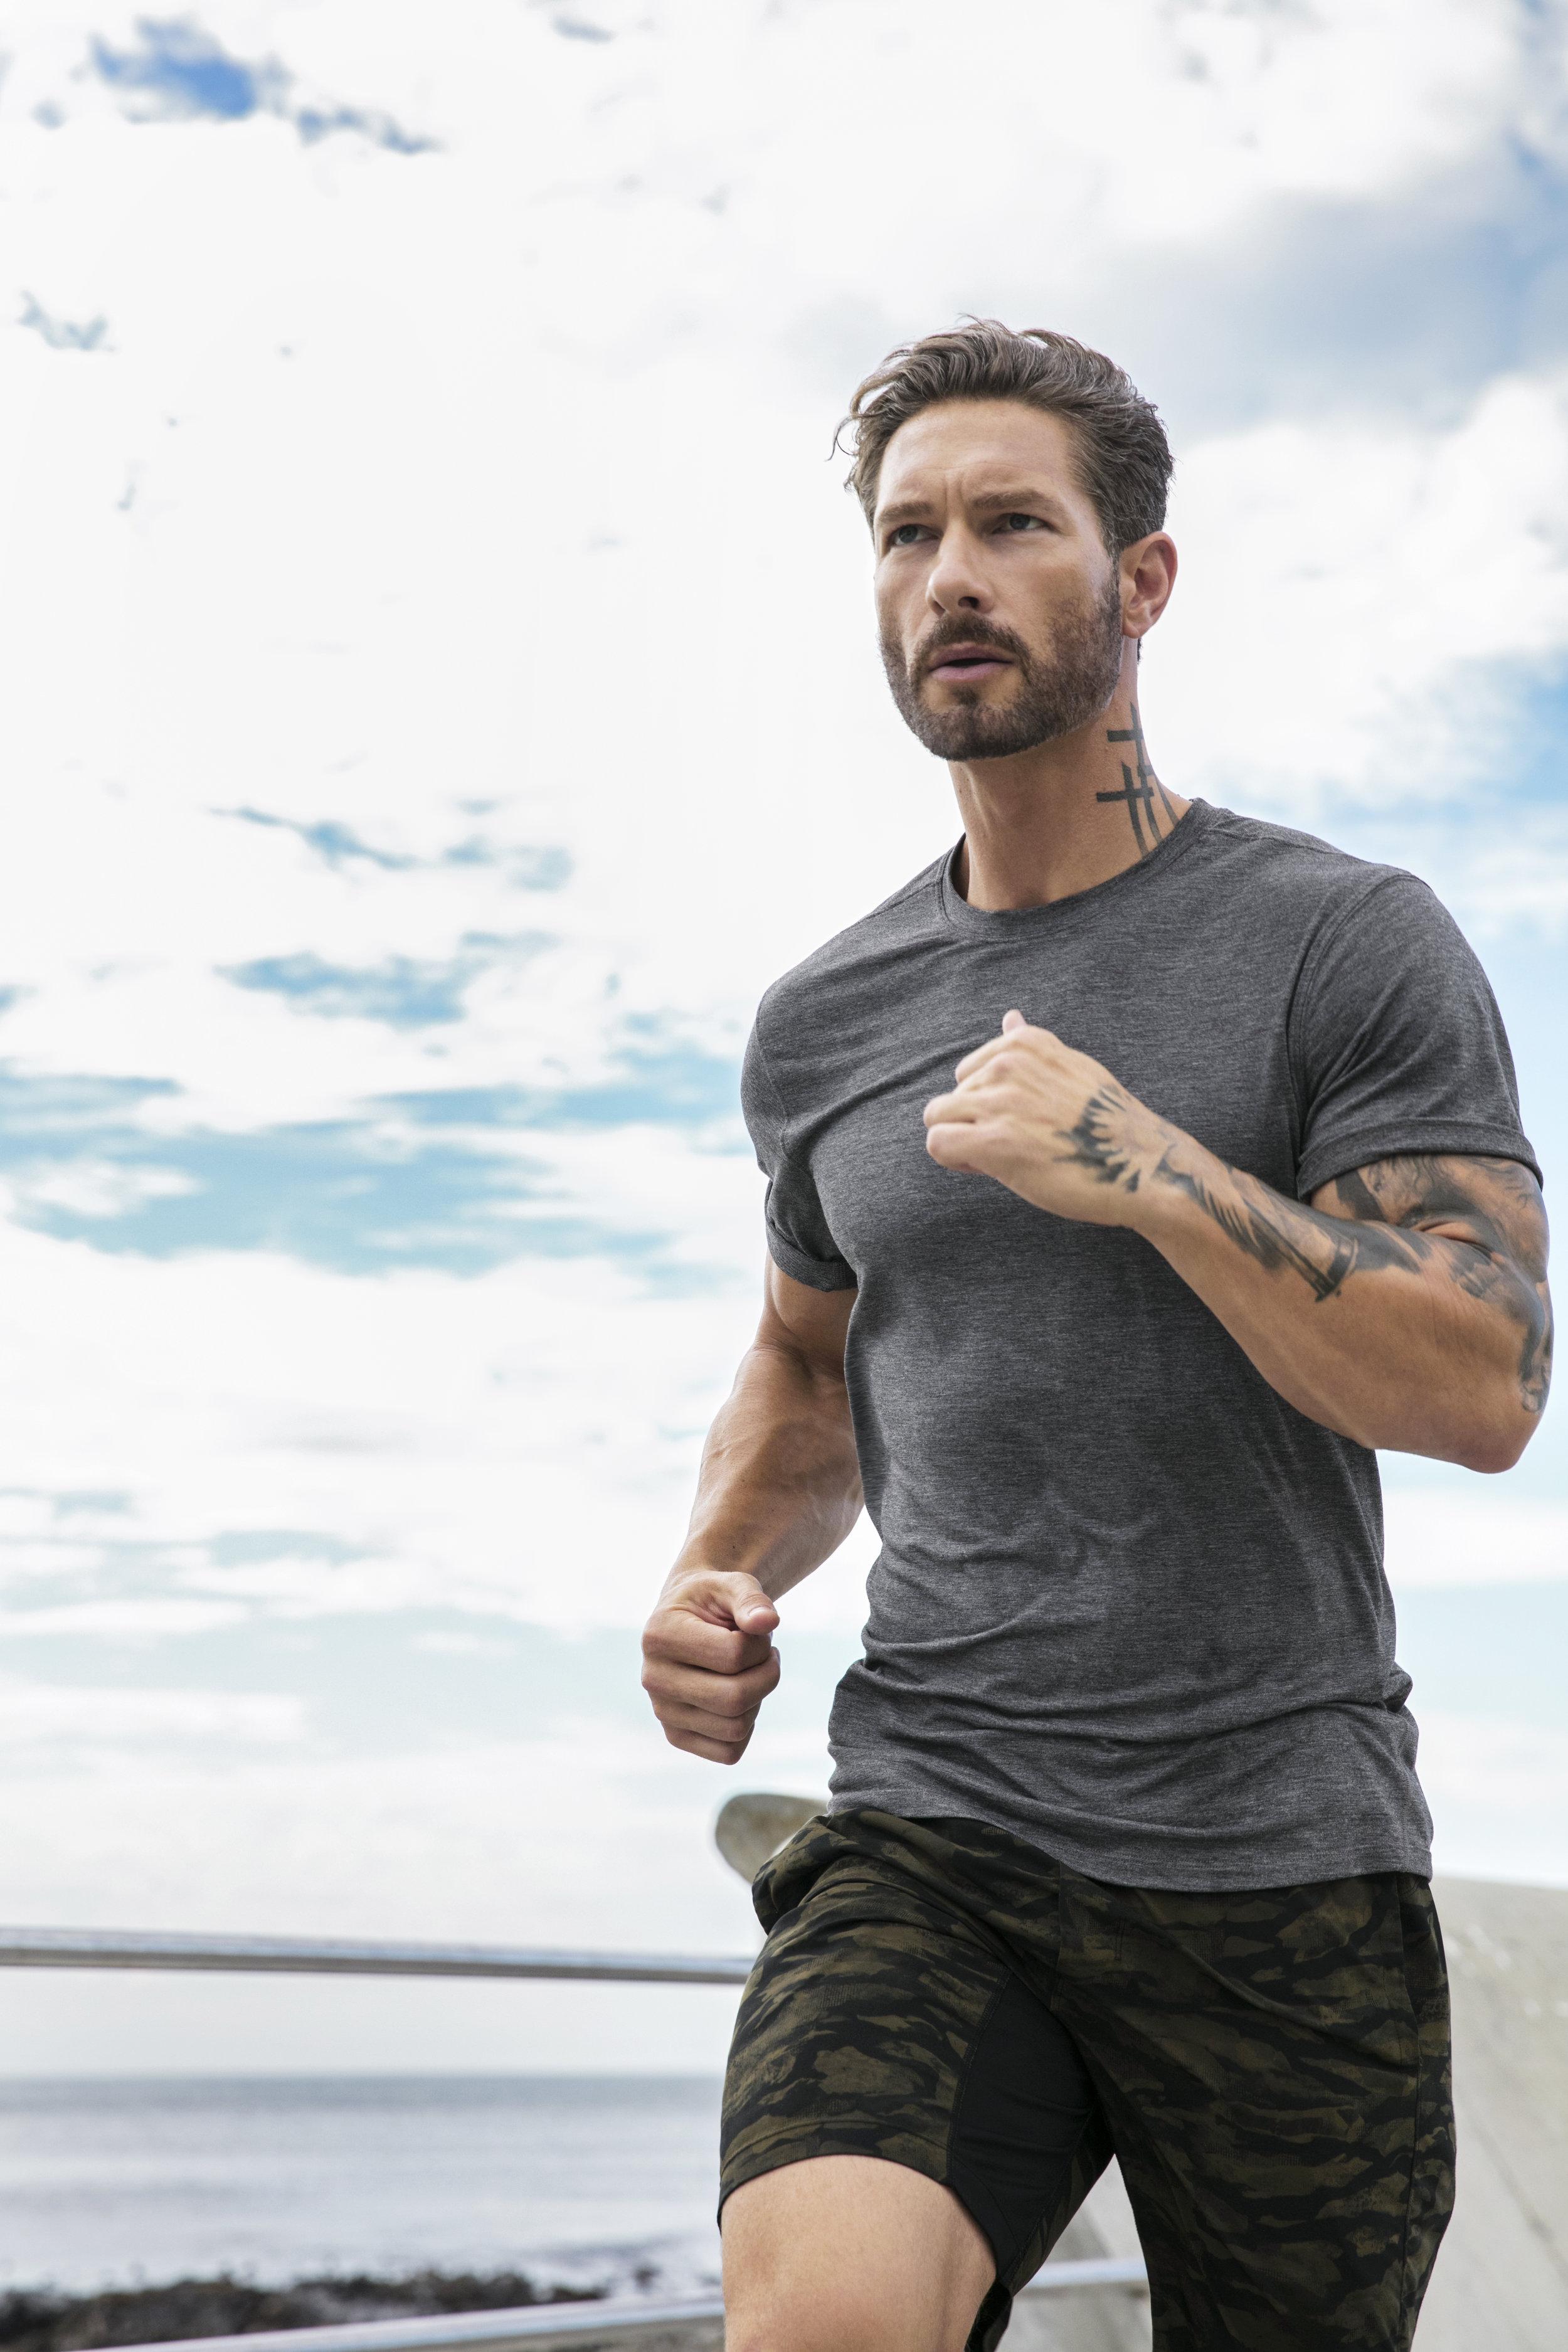 Model and Influencer Weston Boucher | Men's Fitness Blog | Gym Plans